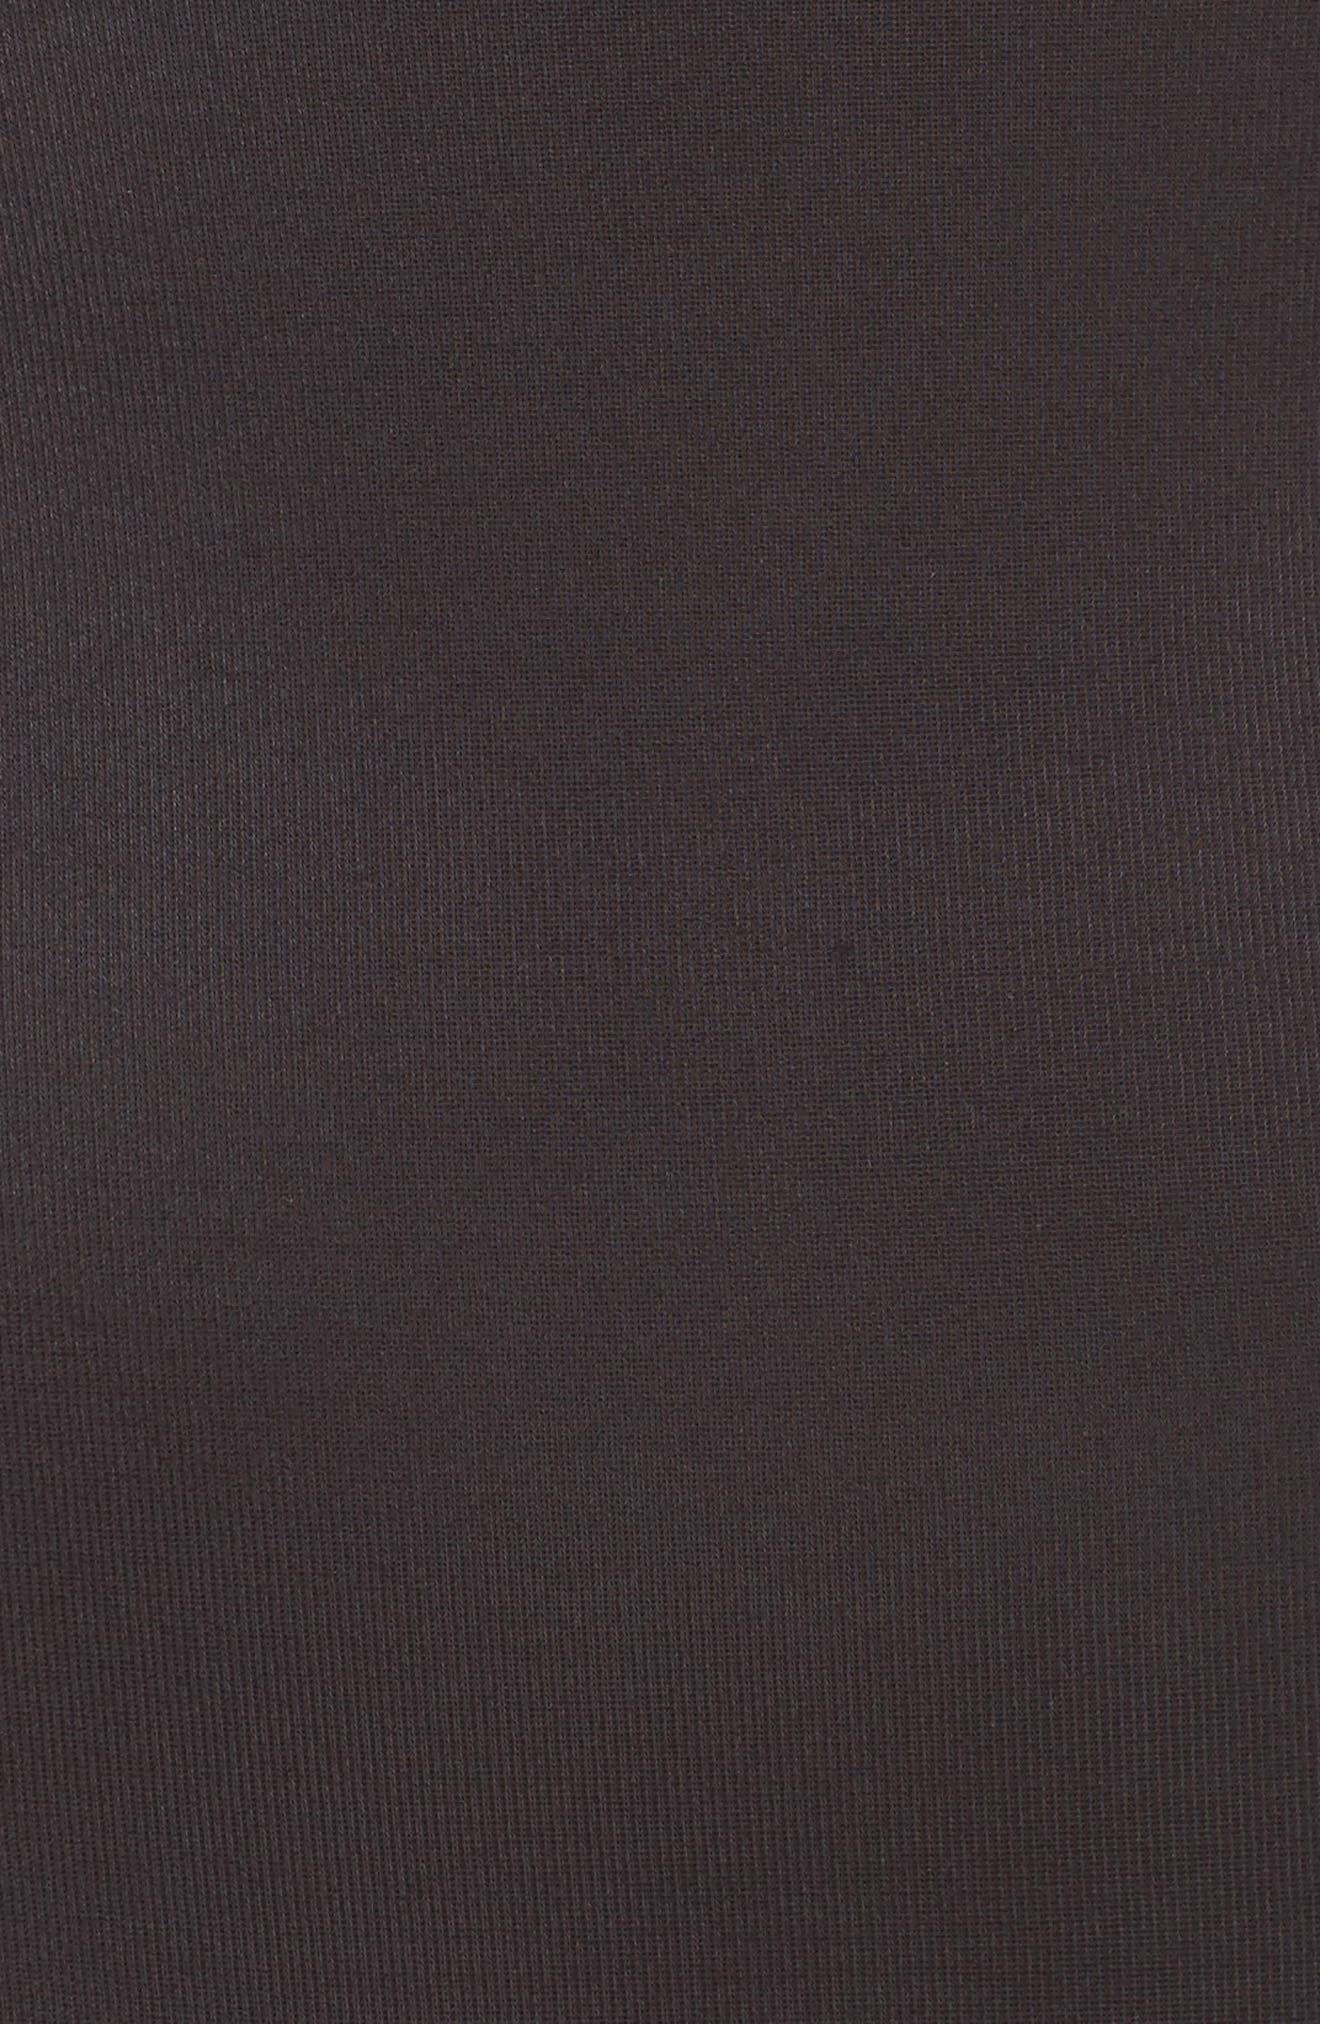 Torsette Underbust Mid Thigh Bodysuit Shaper,                             Alternate thumbnail 6, color,                             BLACK